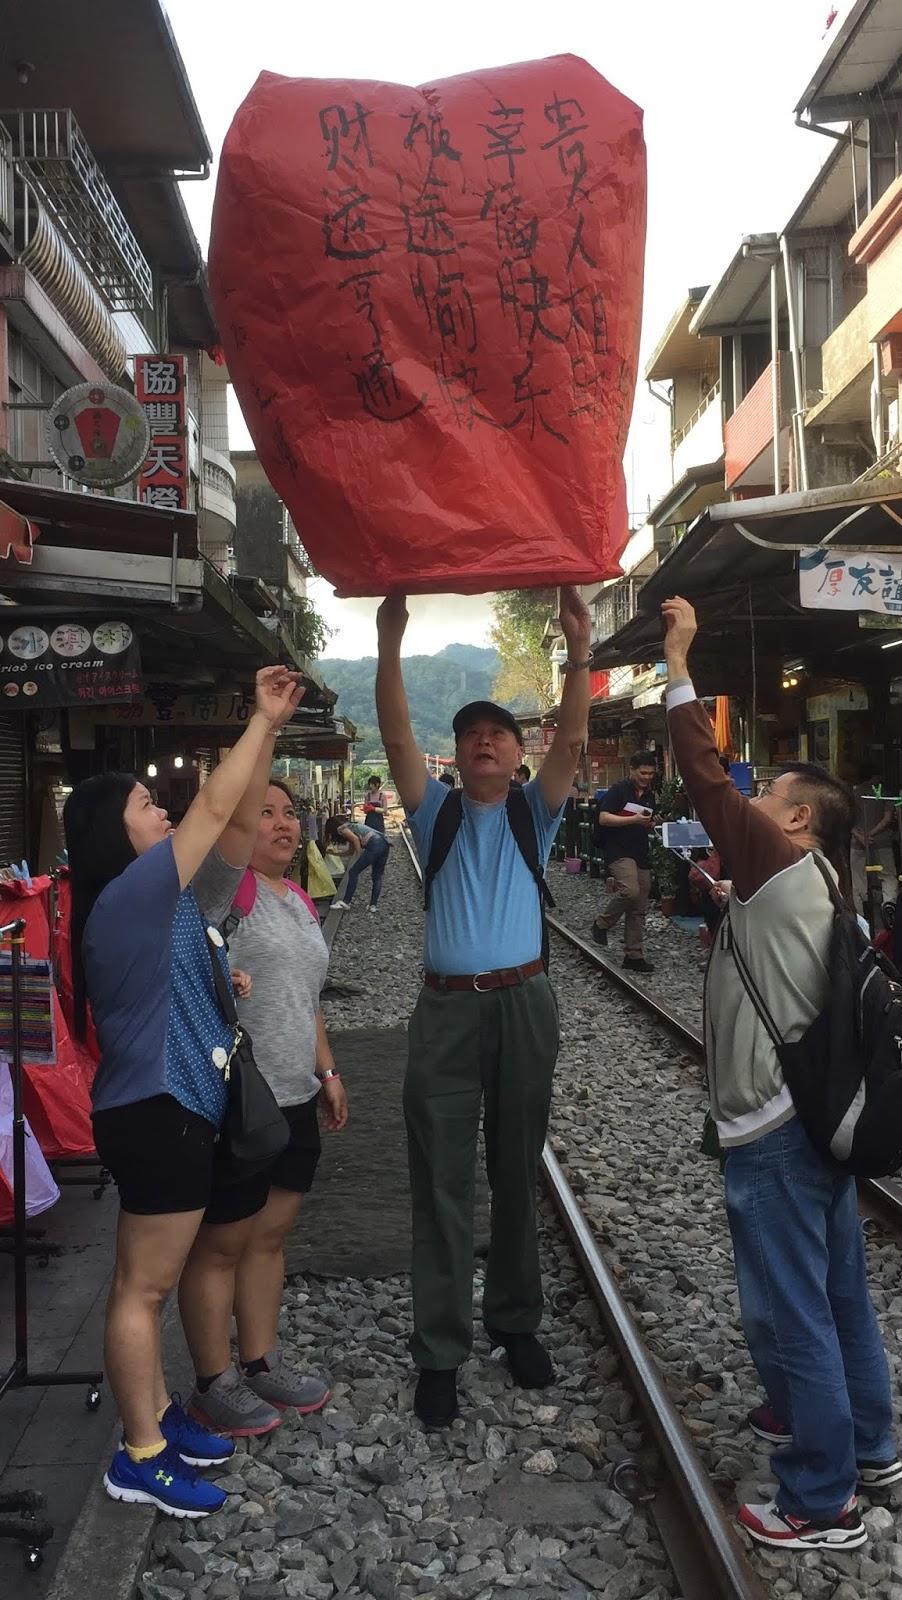 2018 Taiwan Nam Ho: Day 3 - 16/11/2018 Friday 星期五